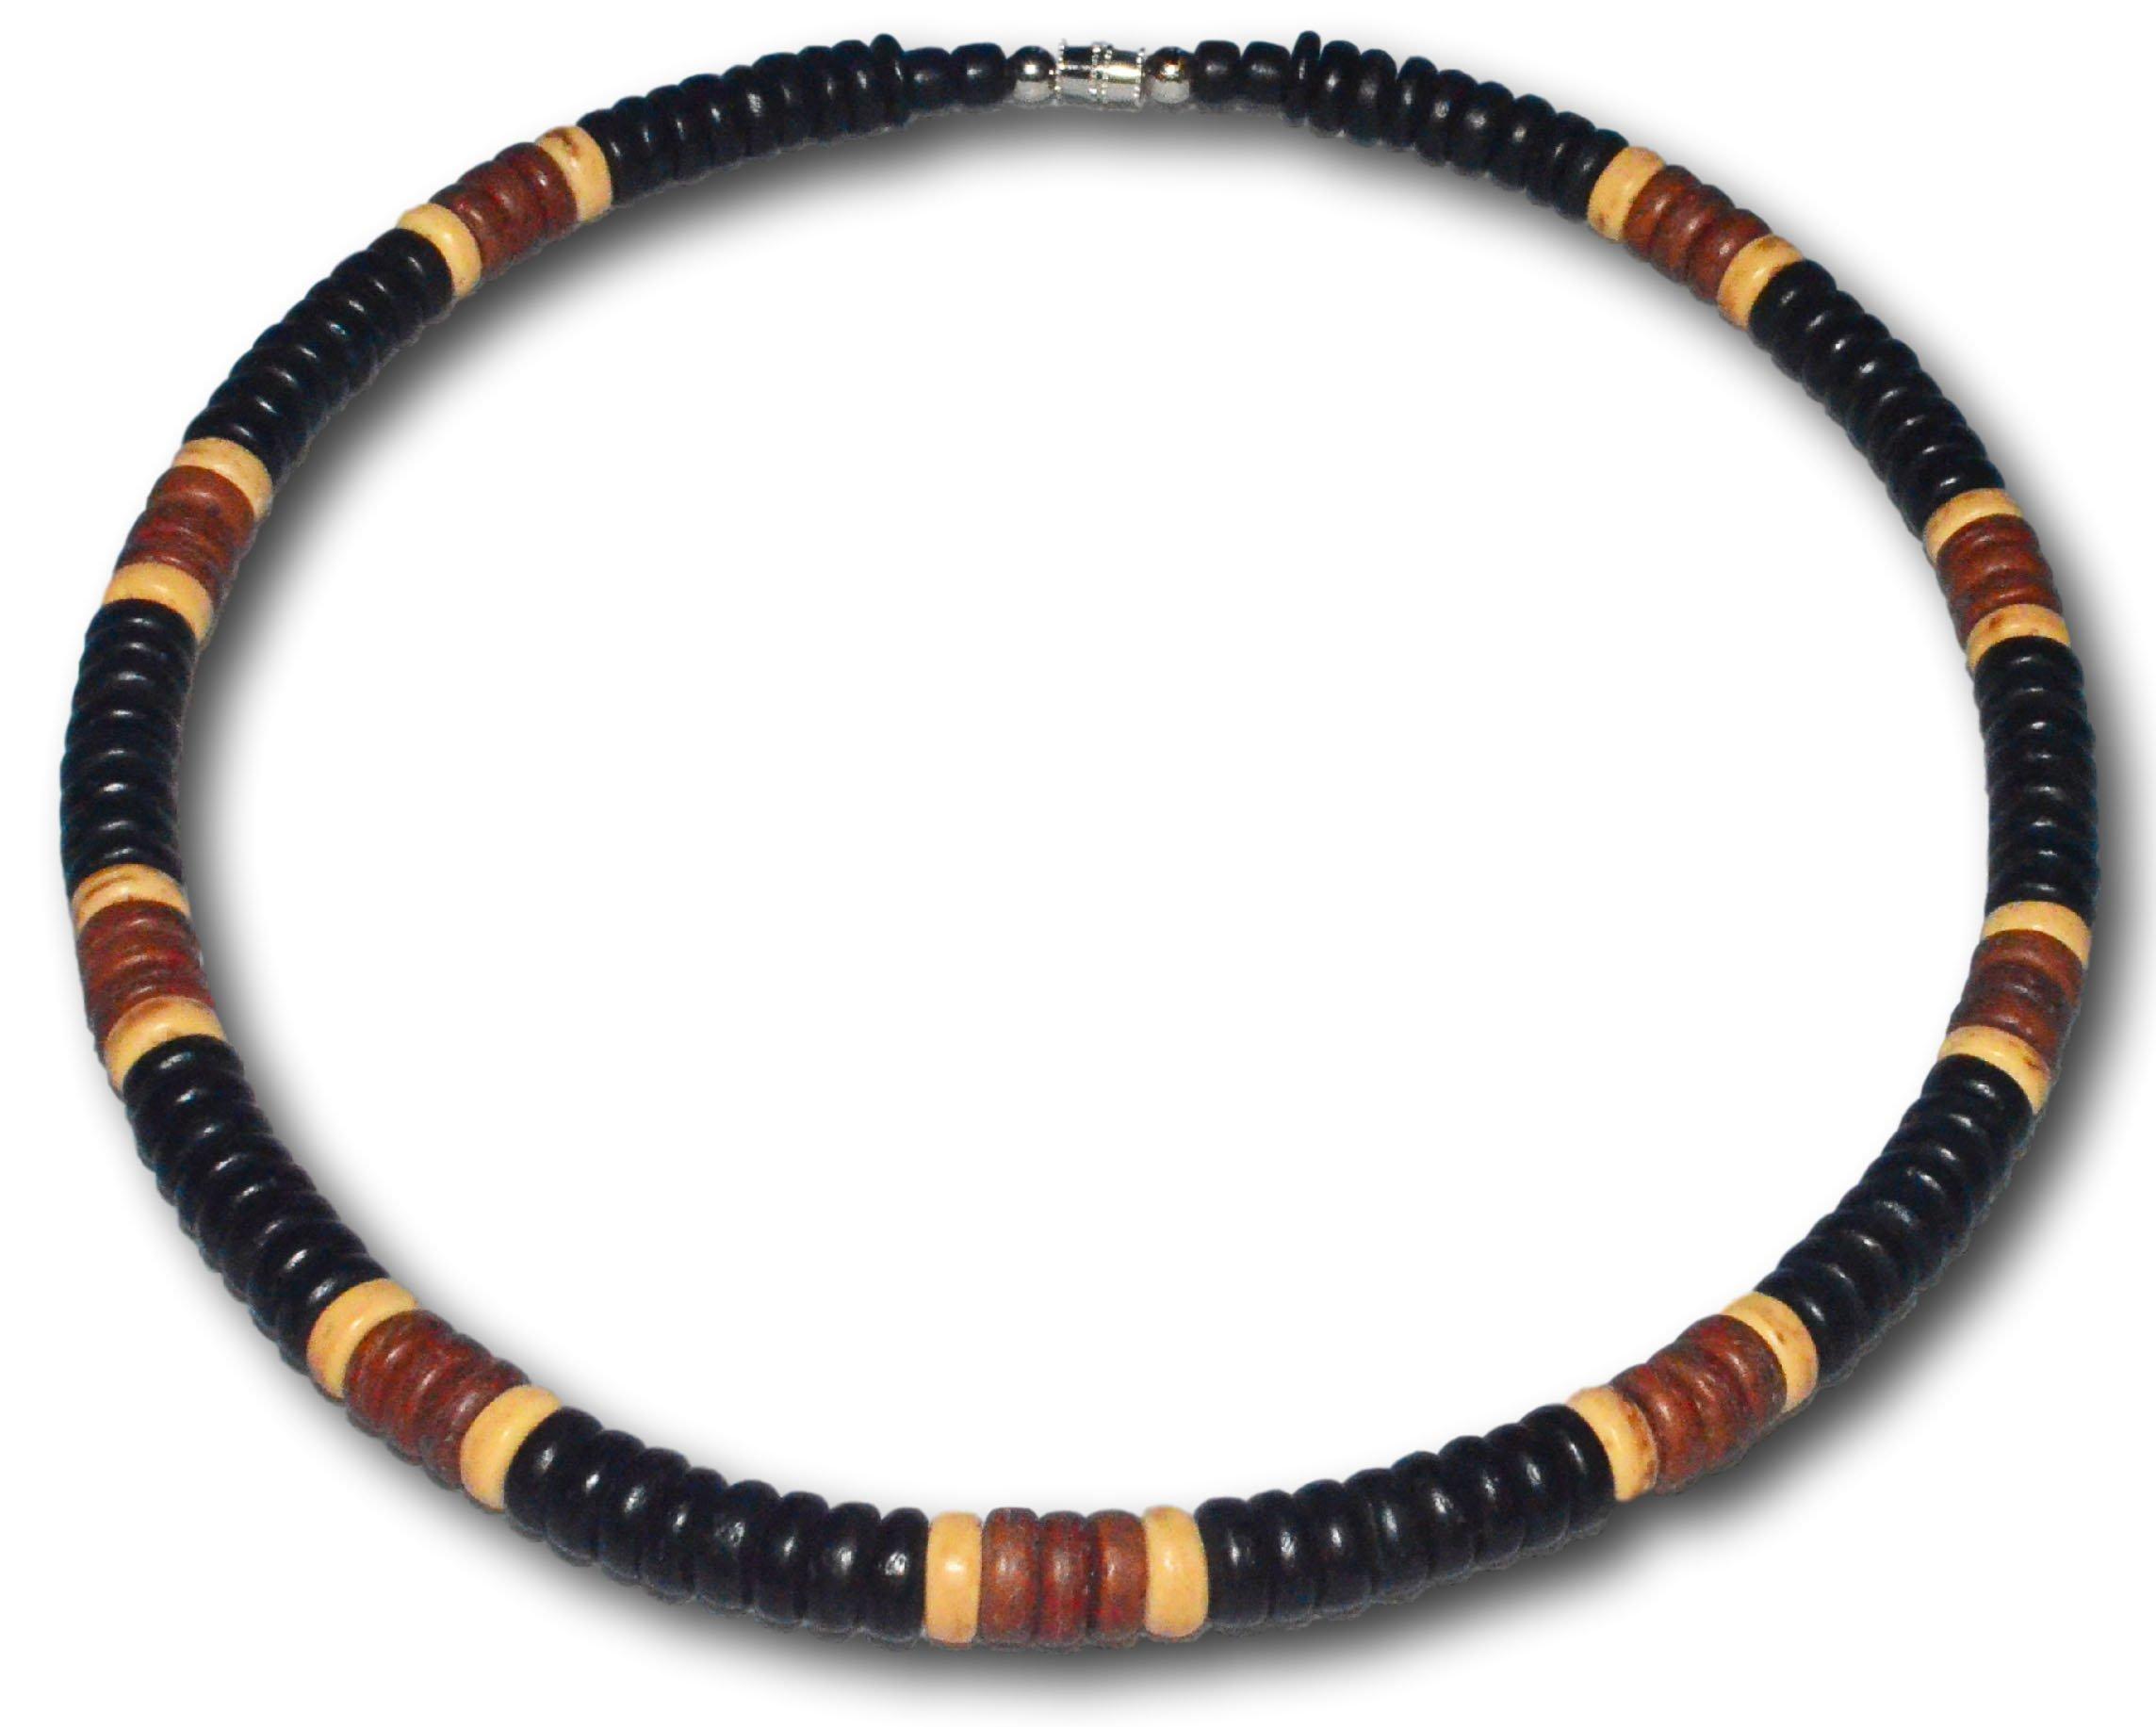 Native Treasure - ''Soho'' Black, Brown Coco Shell Surfer Necklace - 8mm (5/16'') (24)